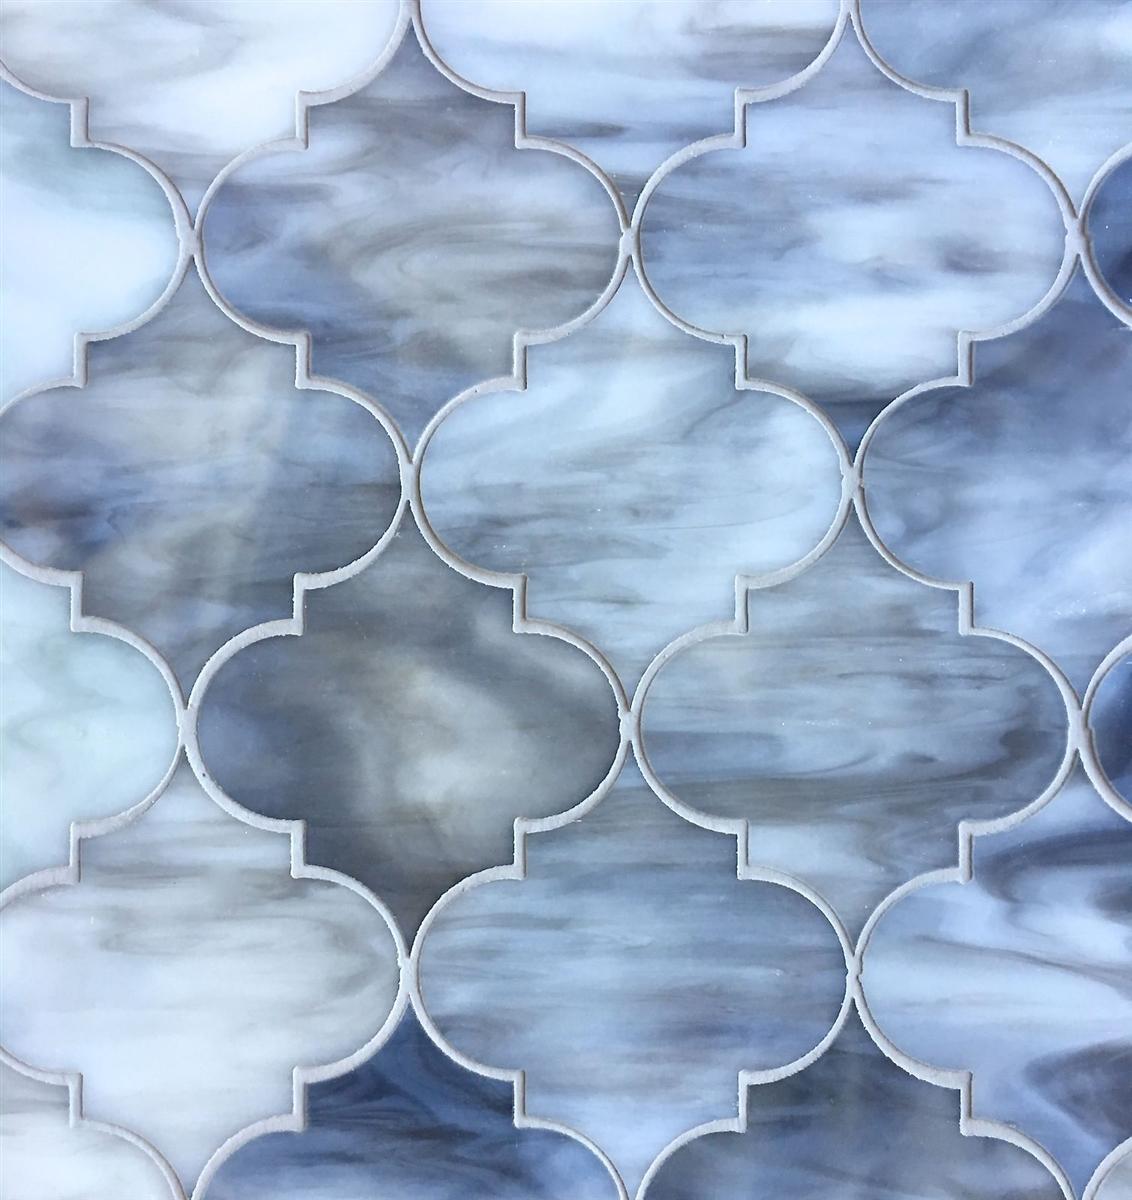 arabesque gray 11 5x13 glass tile mosaic